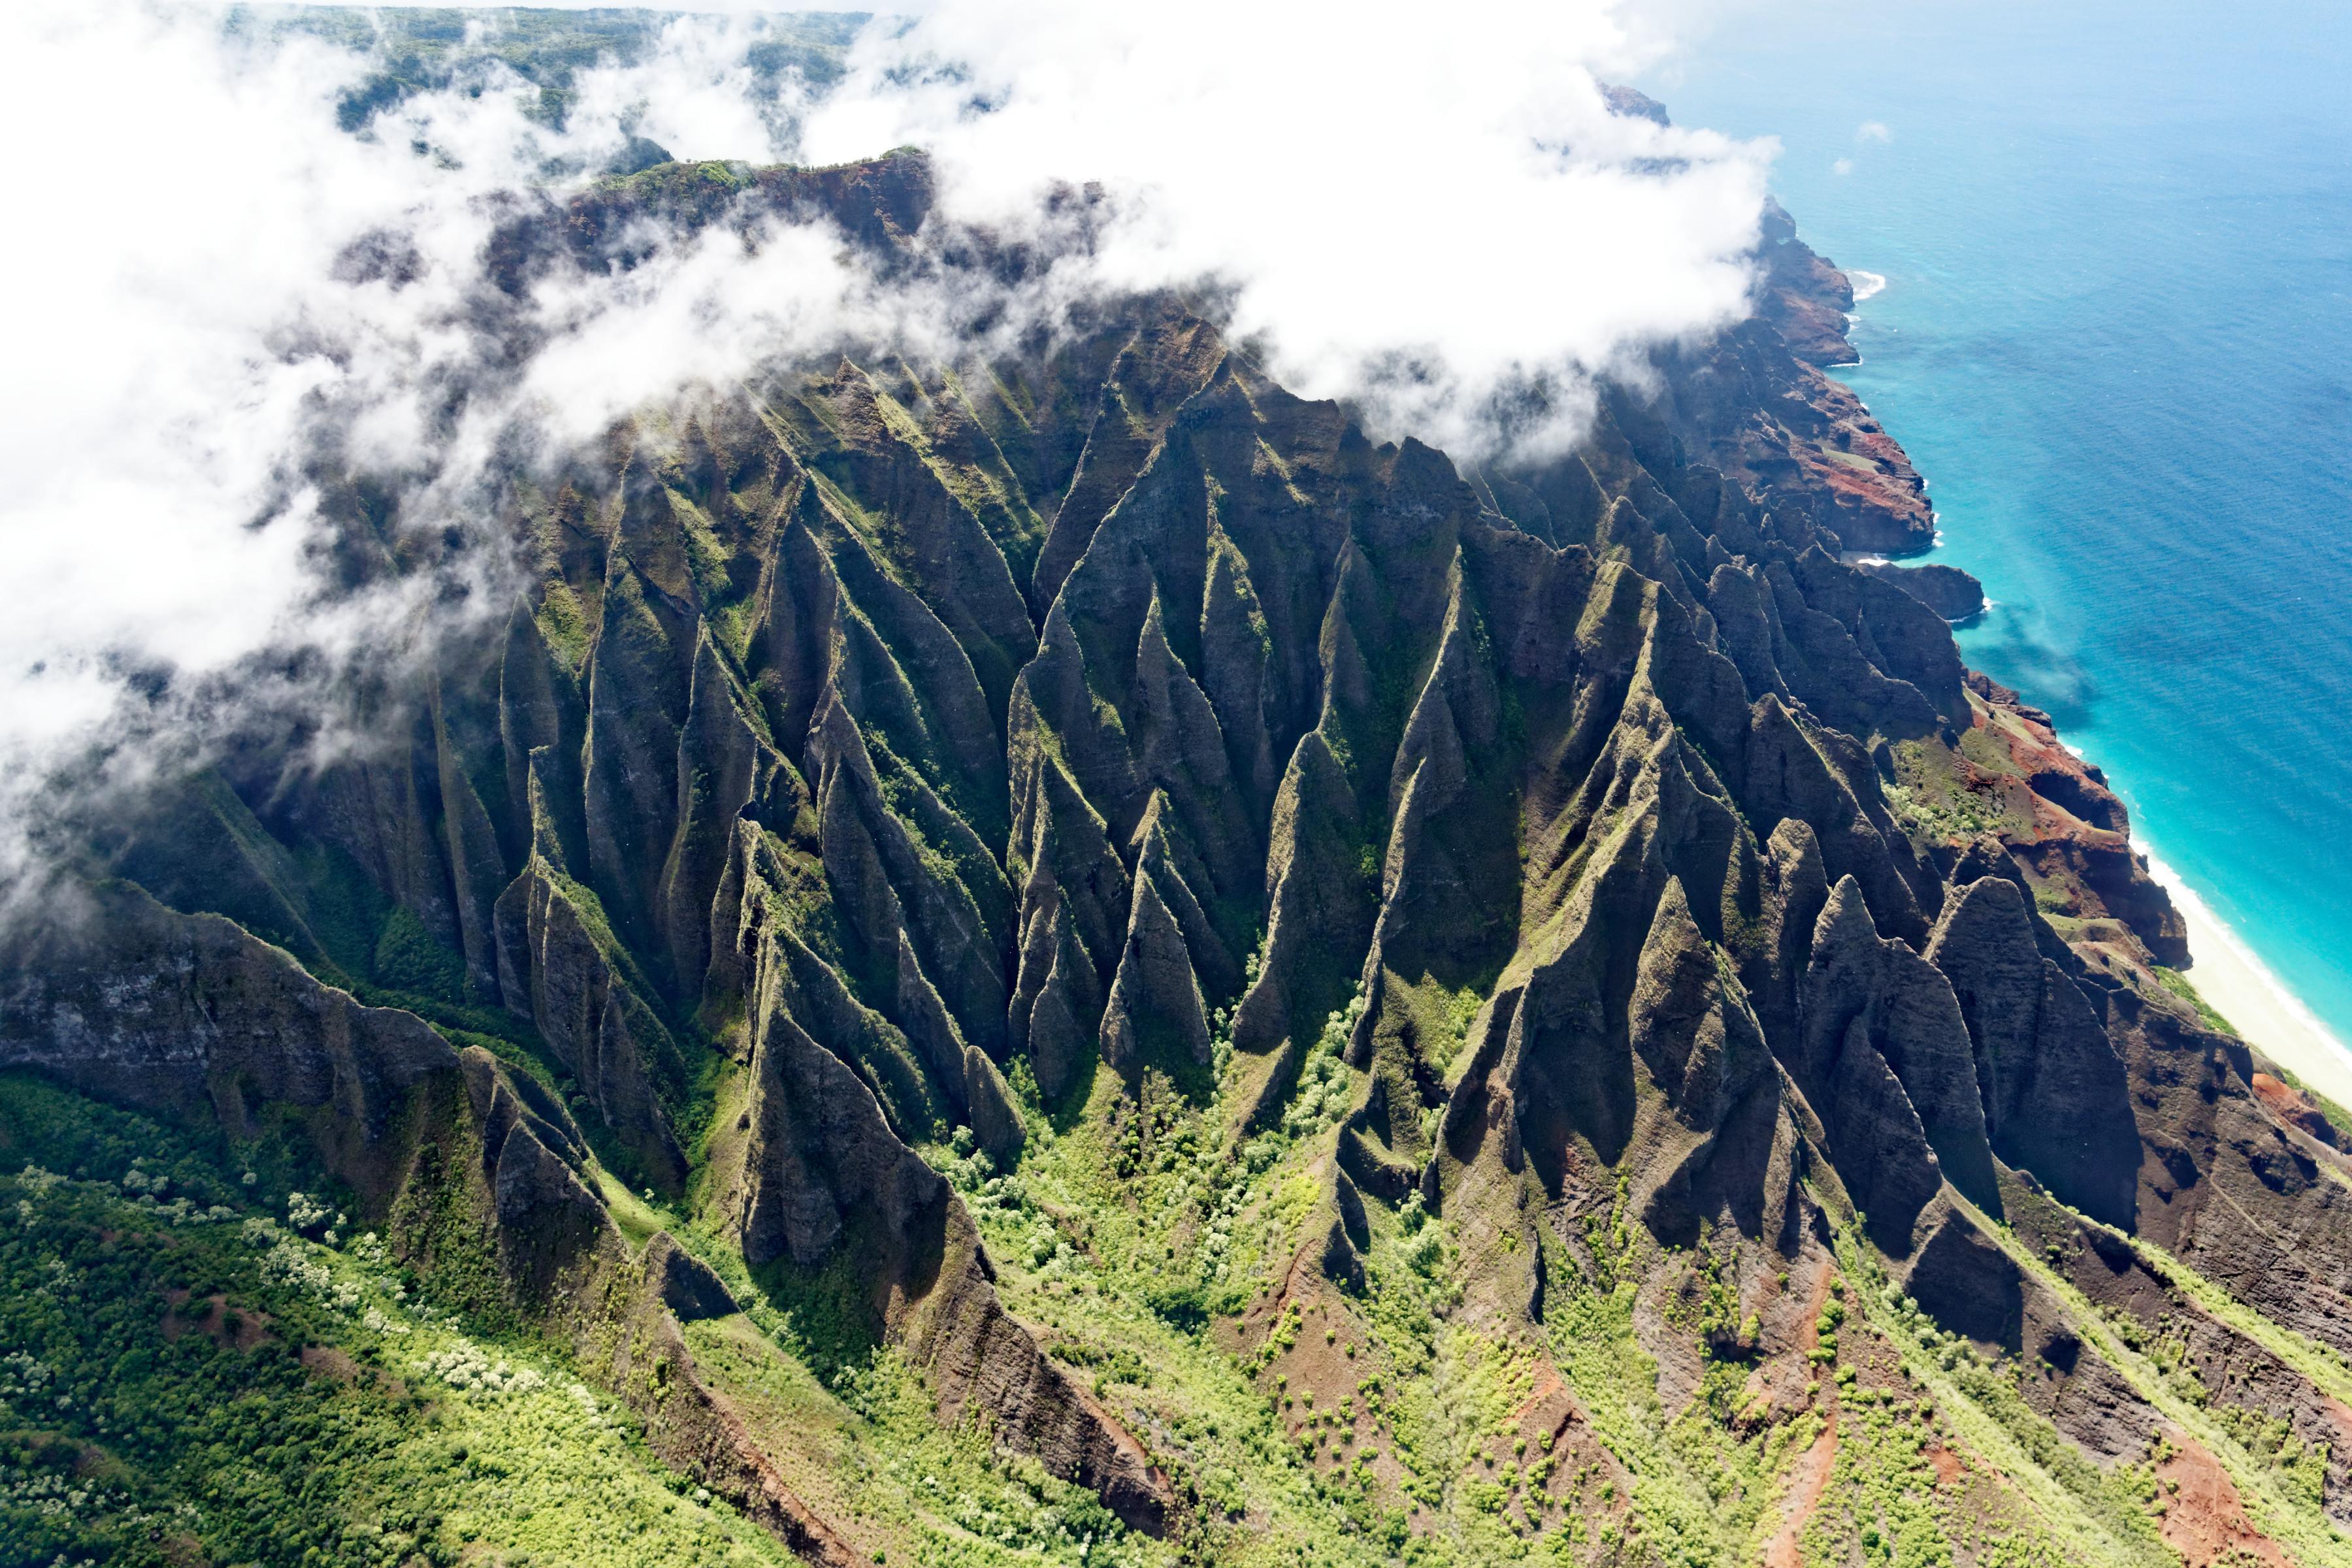 Les arrêtes de la Na Pali coast